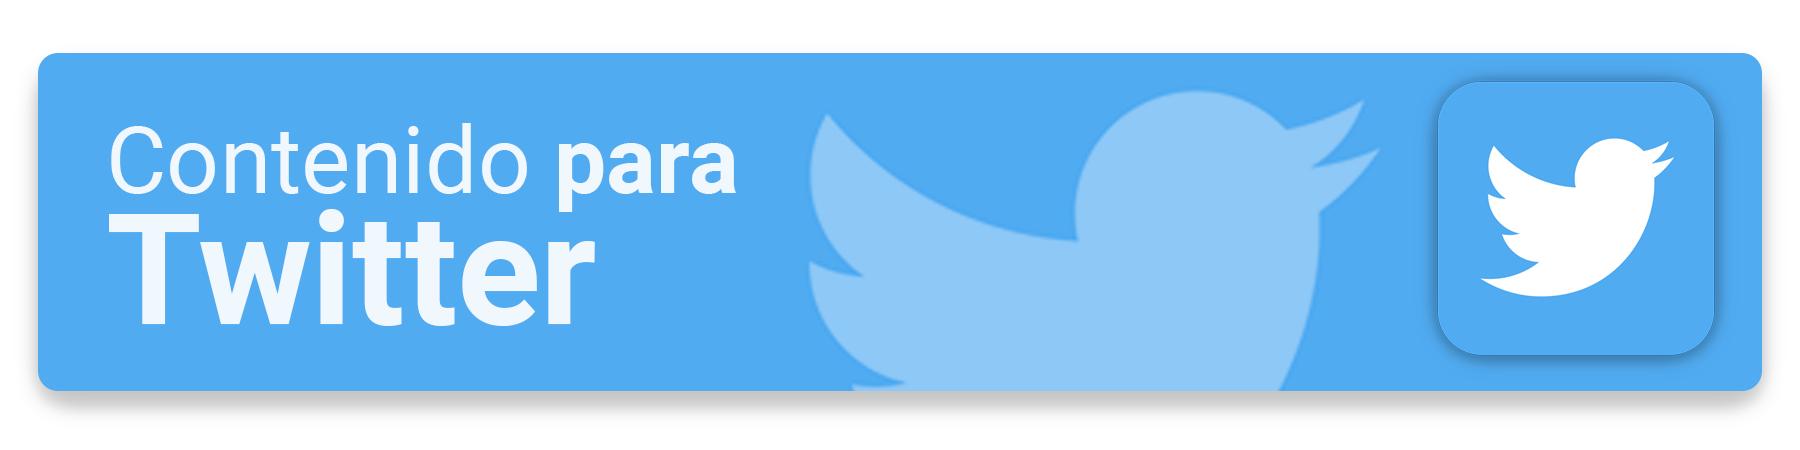 contenido-para-twitter